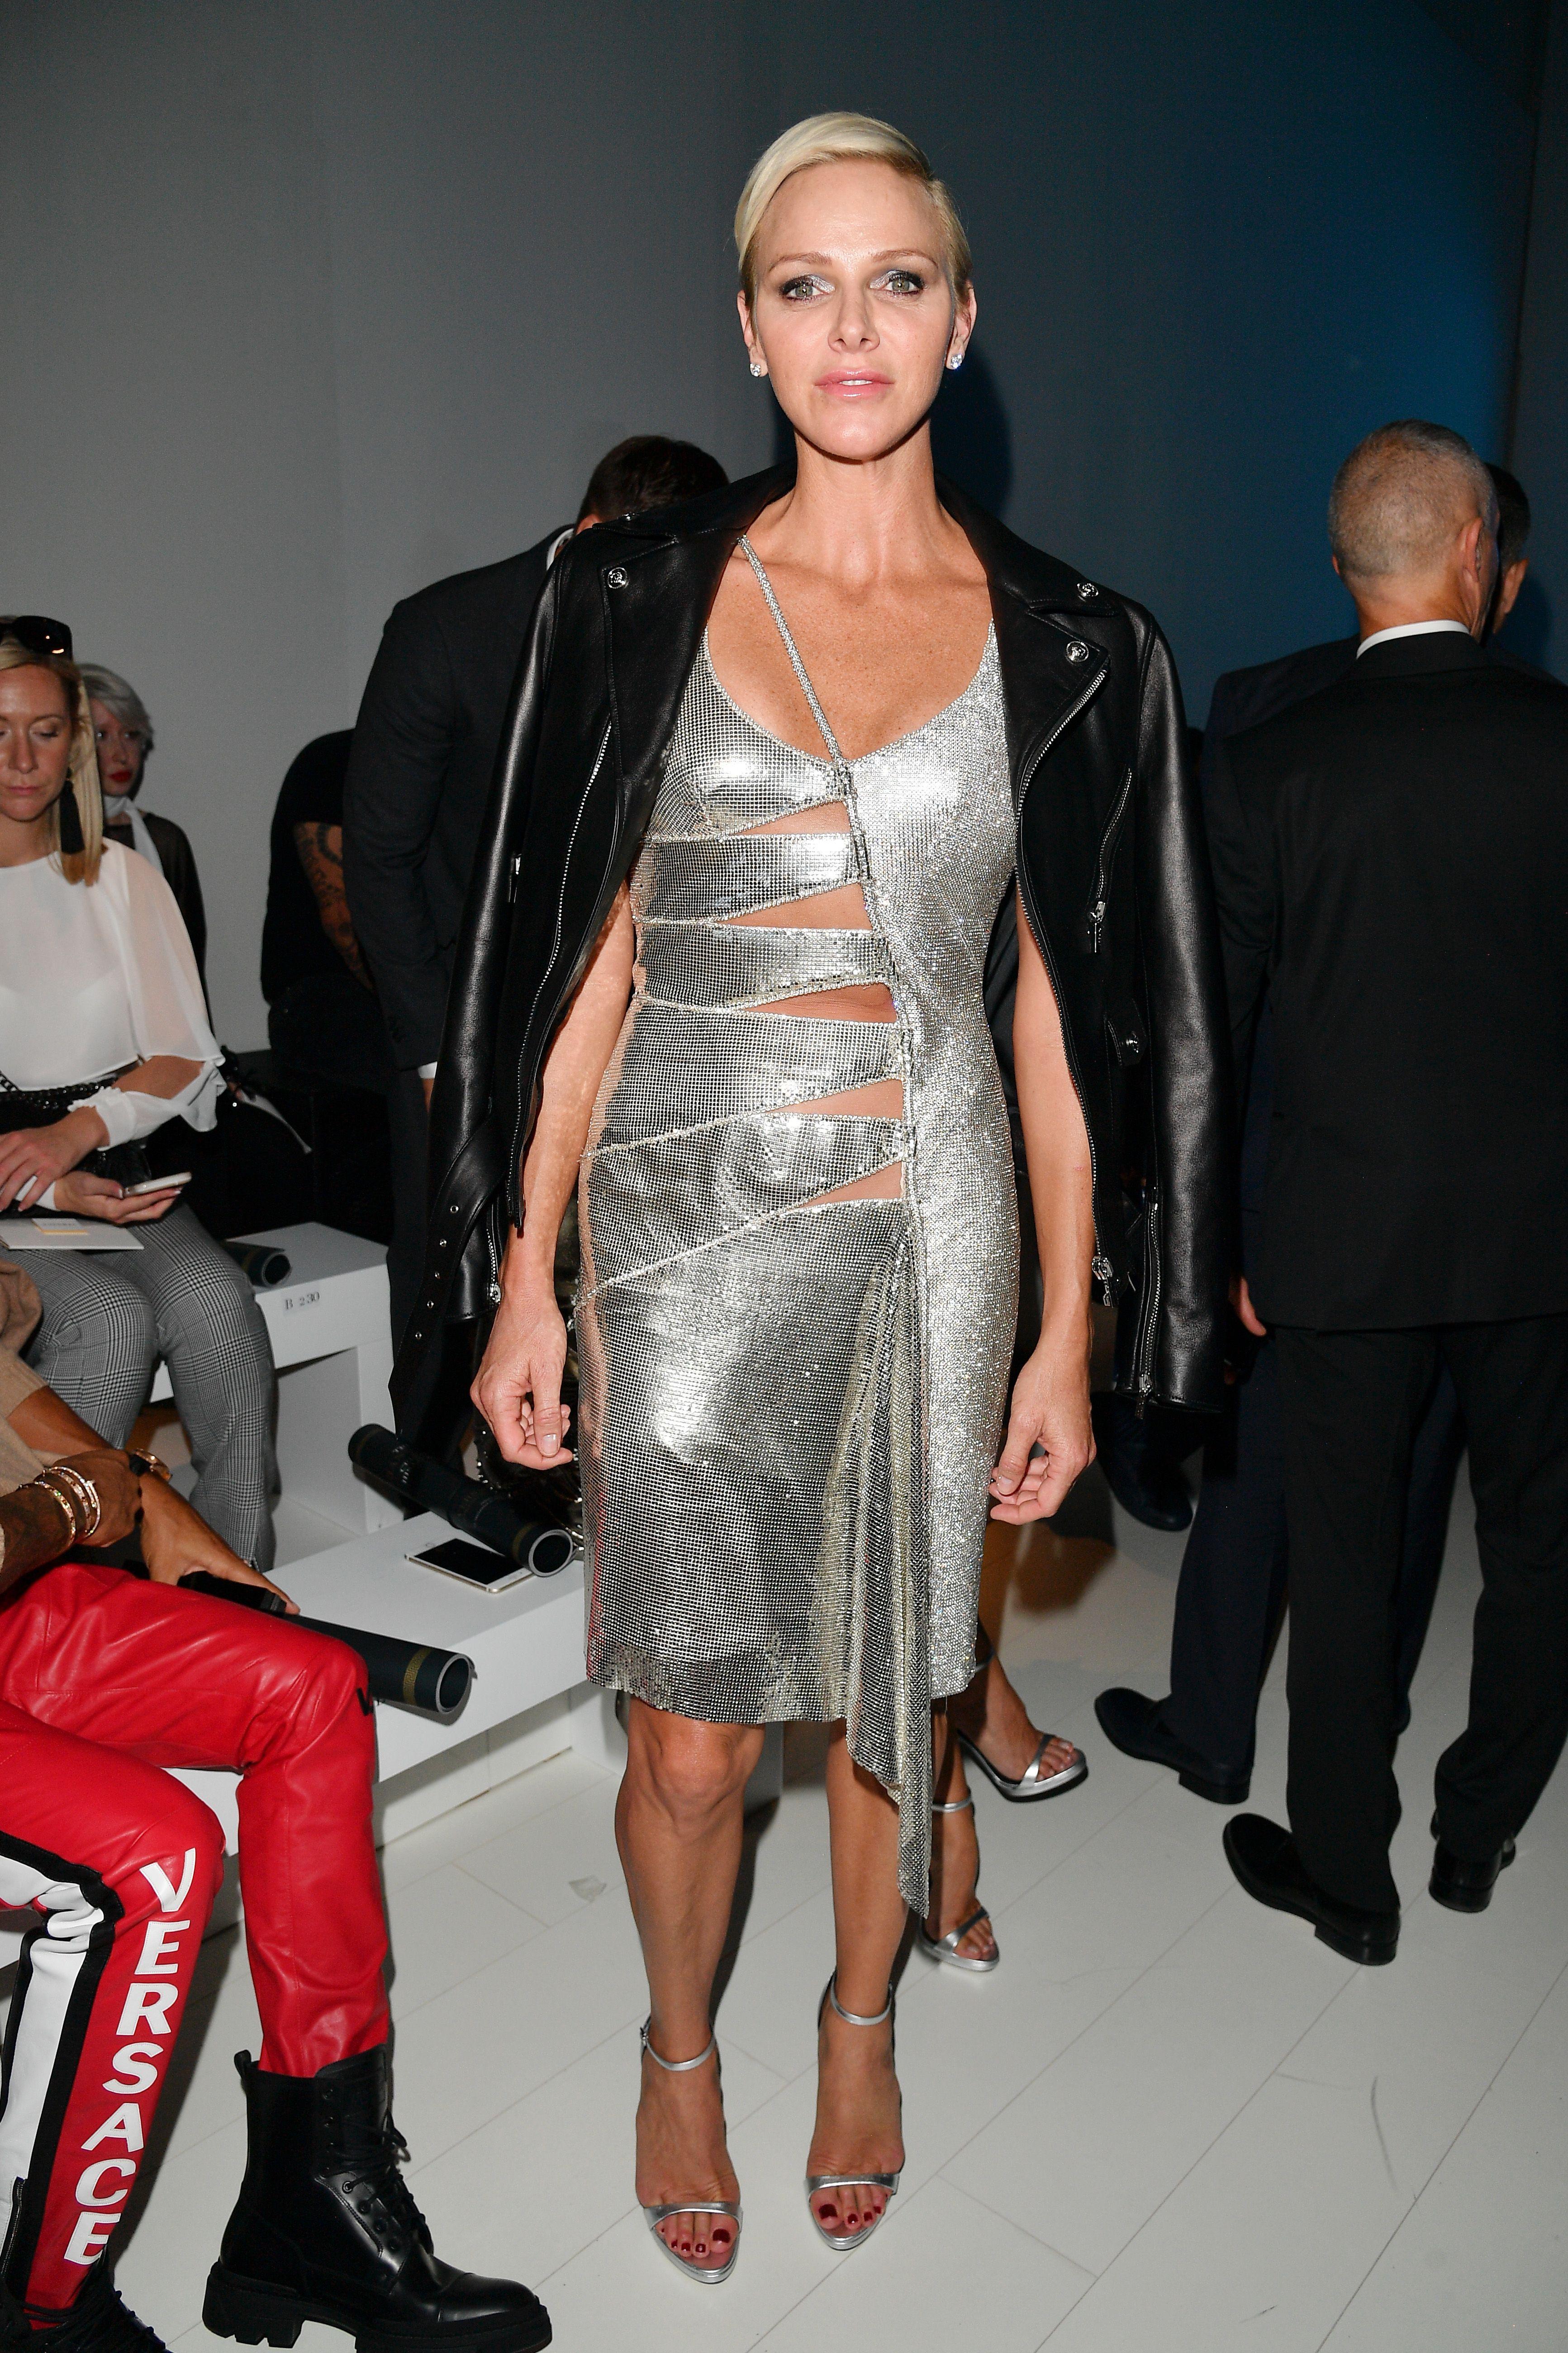 Princess Monaco Charlene Wittstock: athlete, beauty and ... mom 74